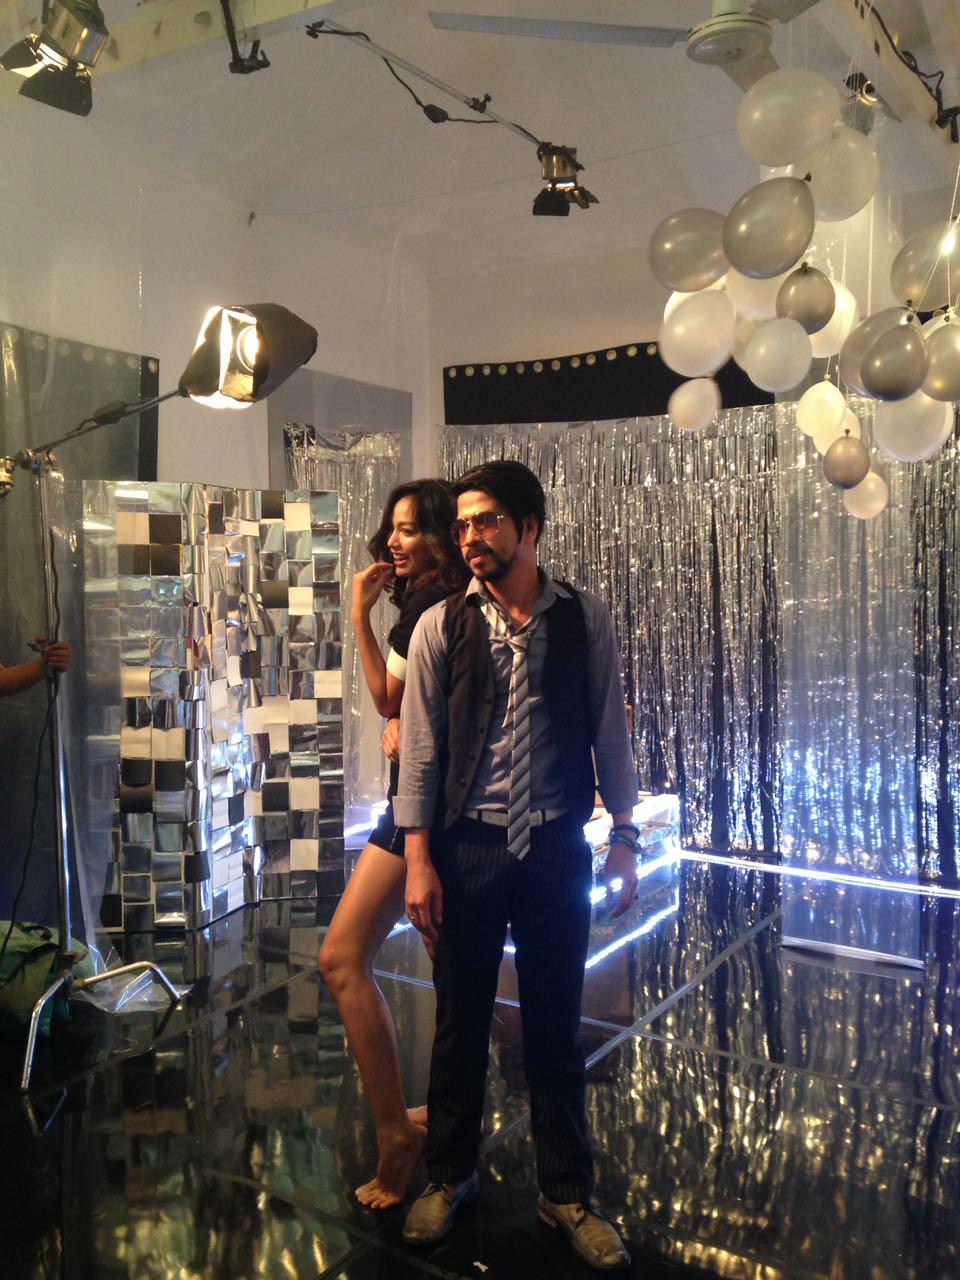 The Dance Company Libatkan Miss Universe di Video Klip Dance With You